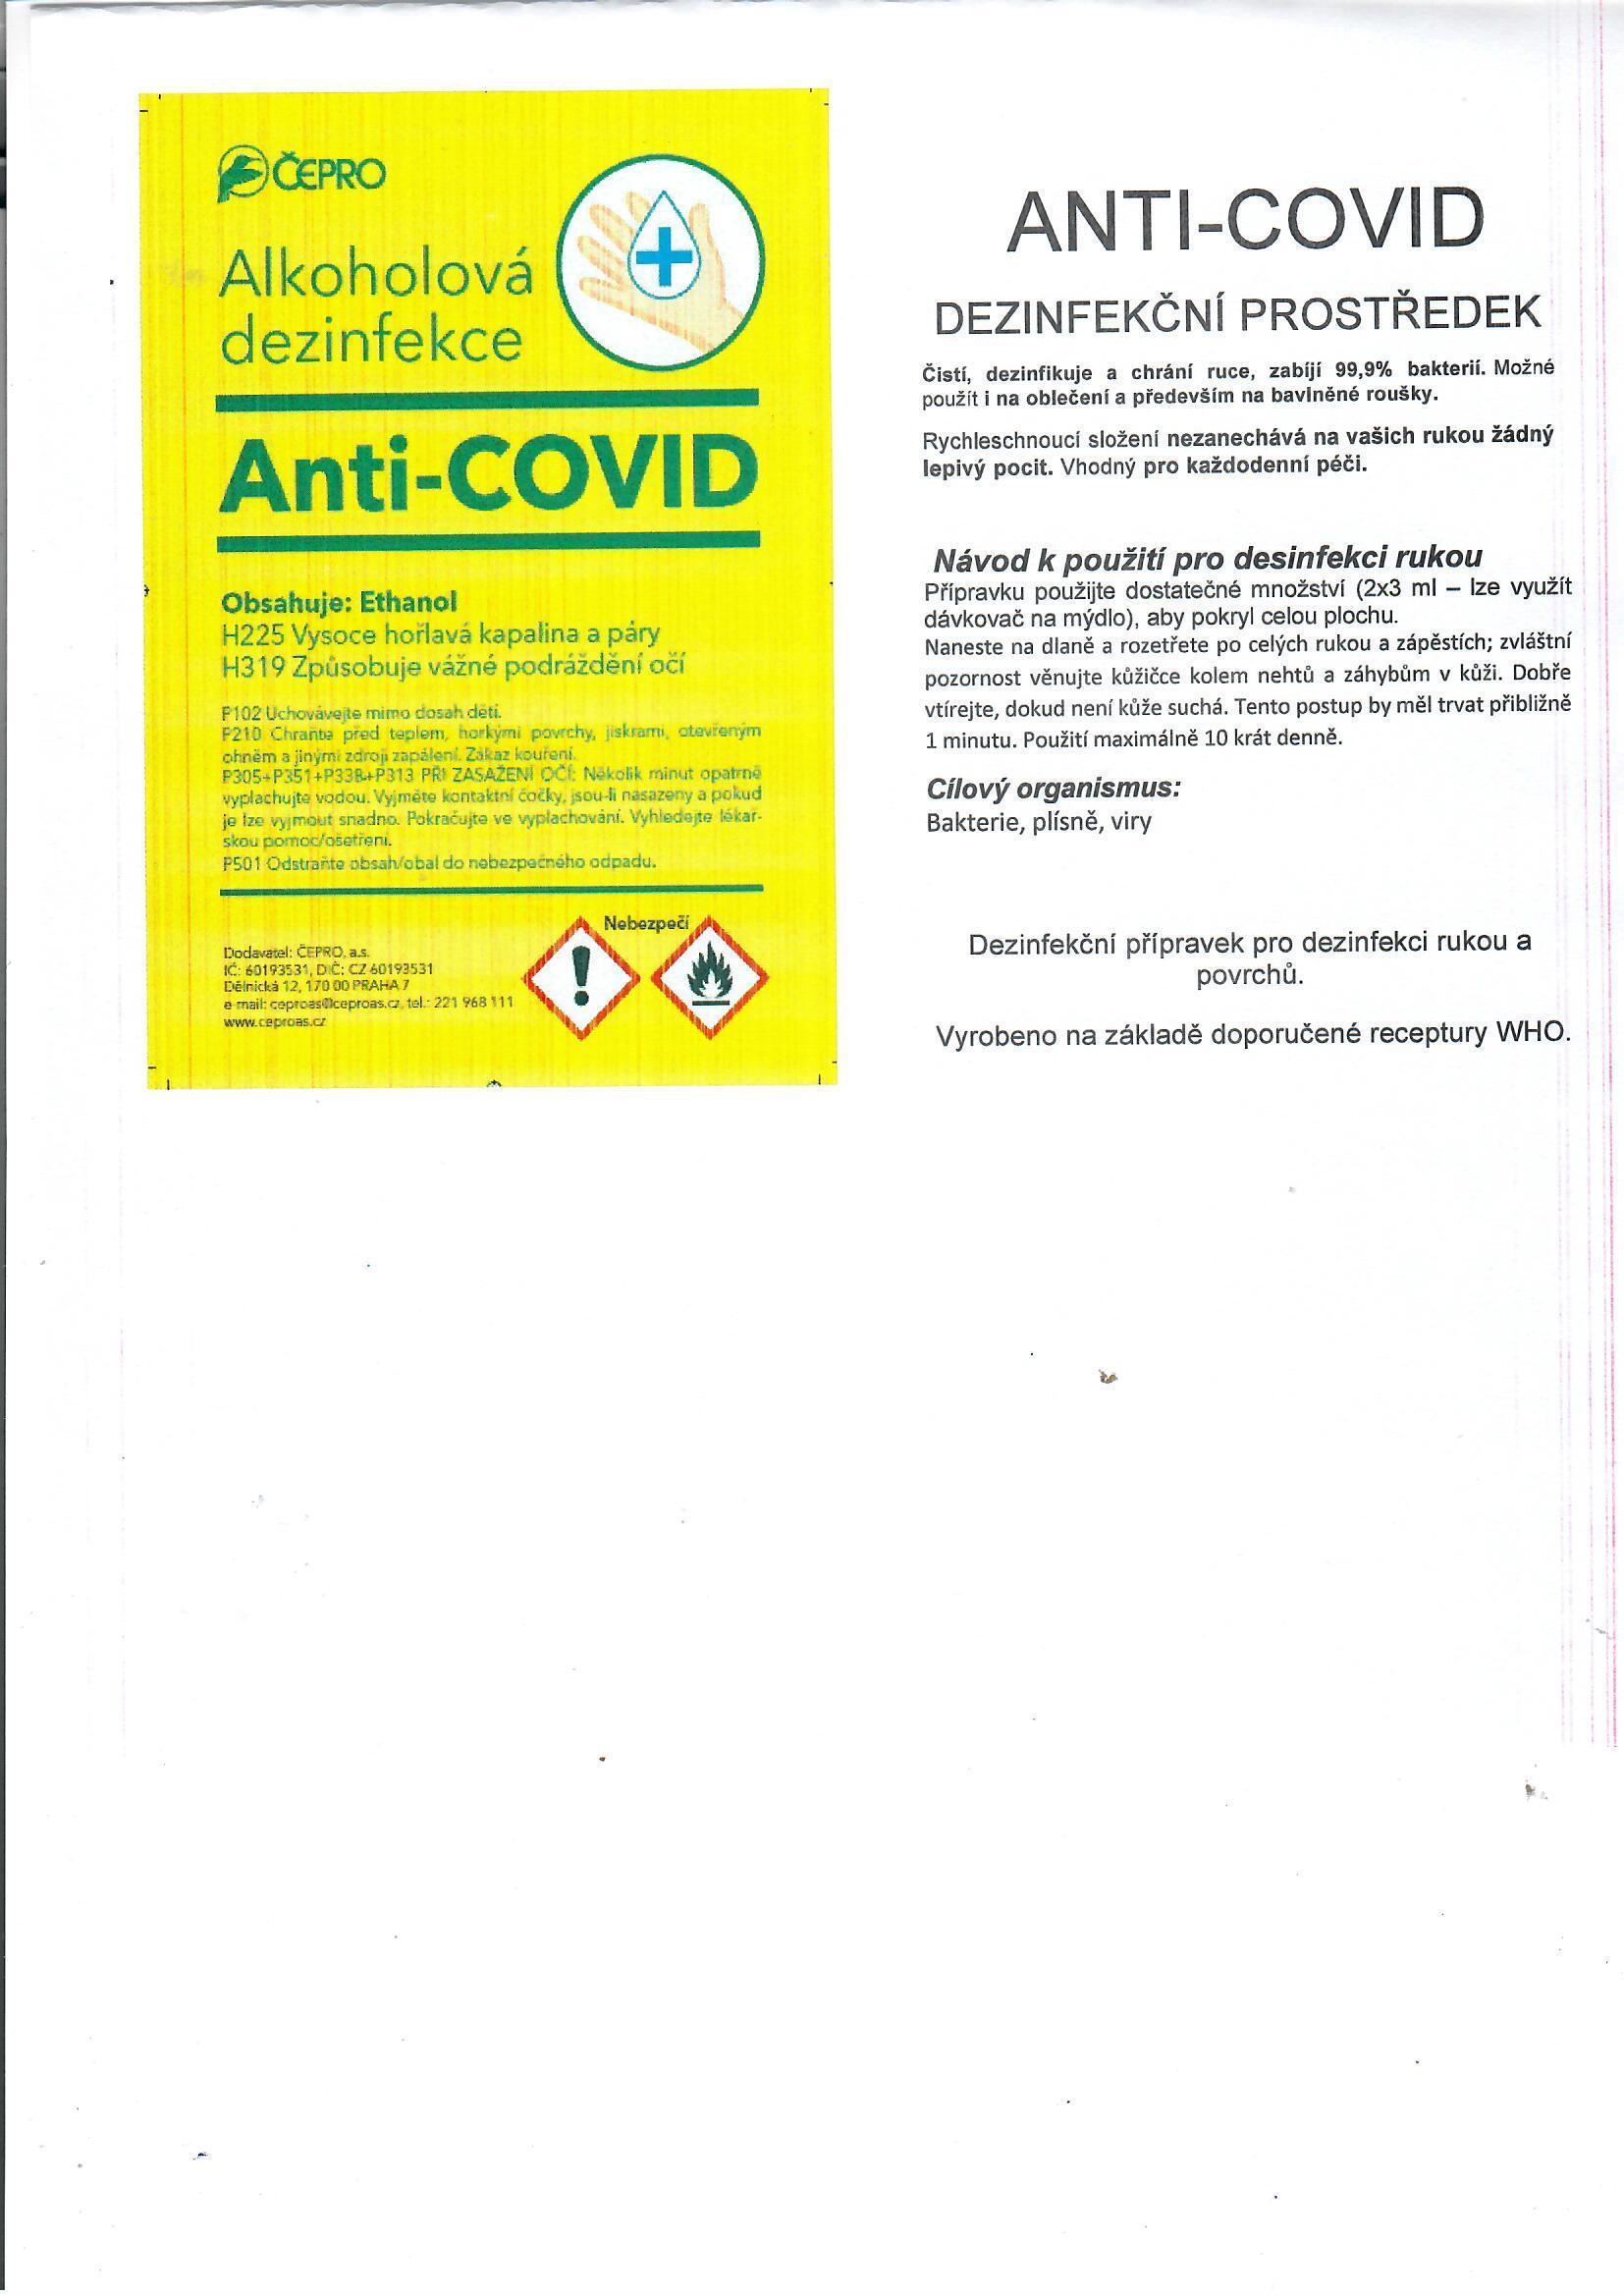 Distribuce desinfekce